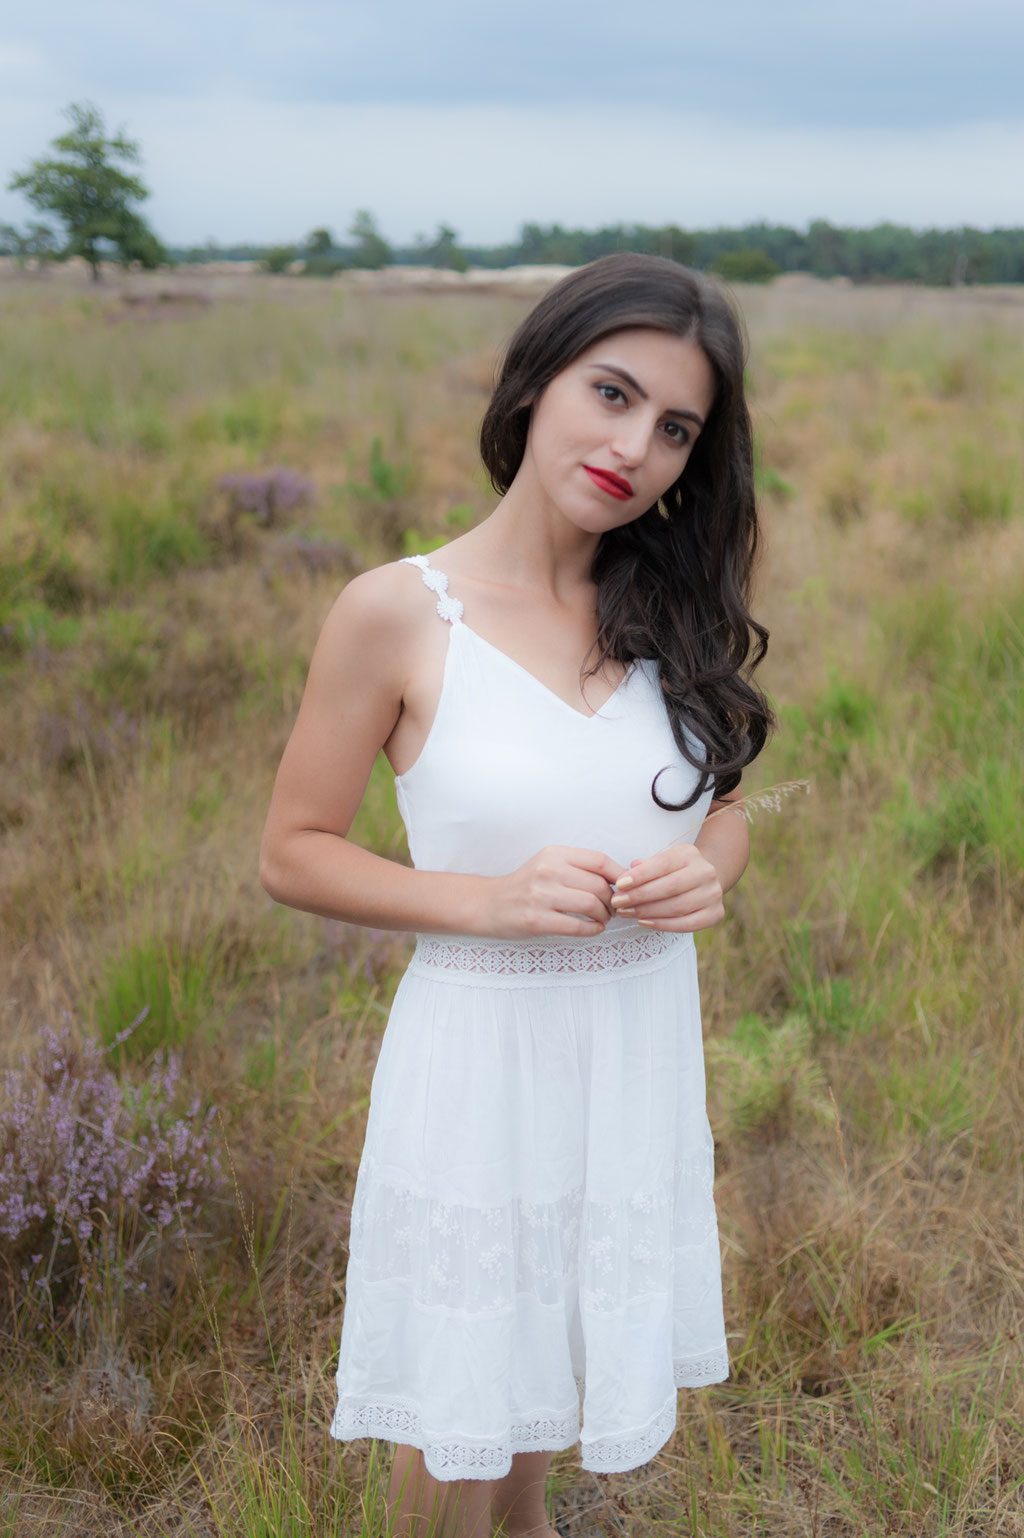 Model: Margarita